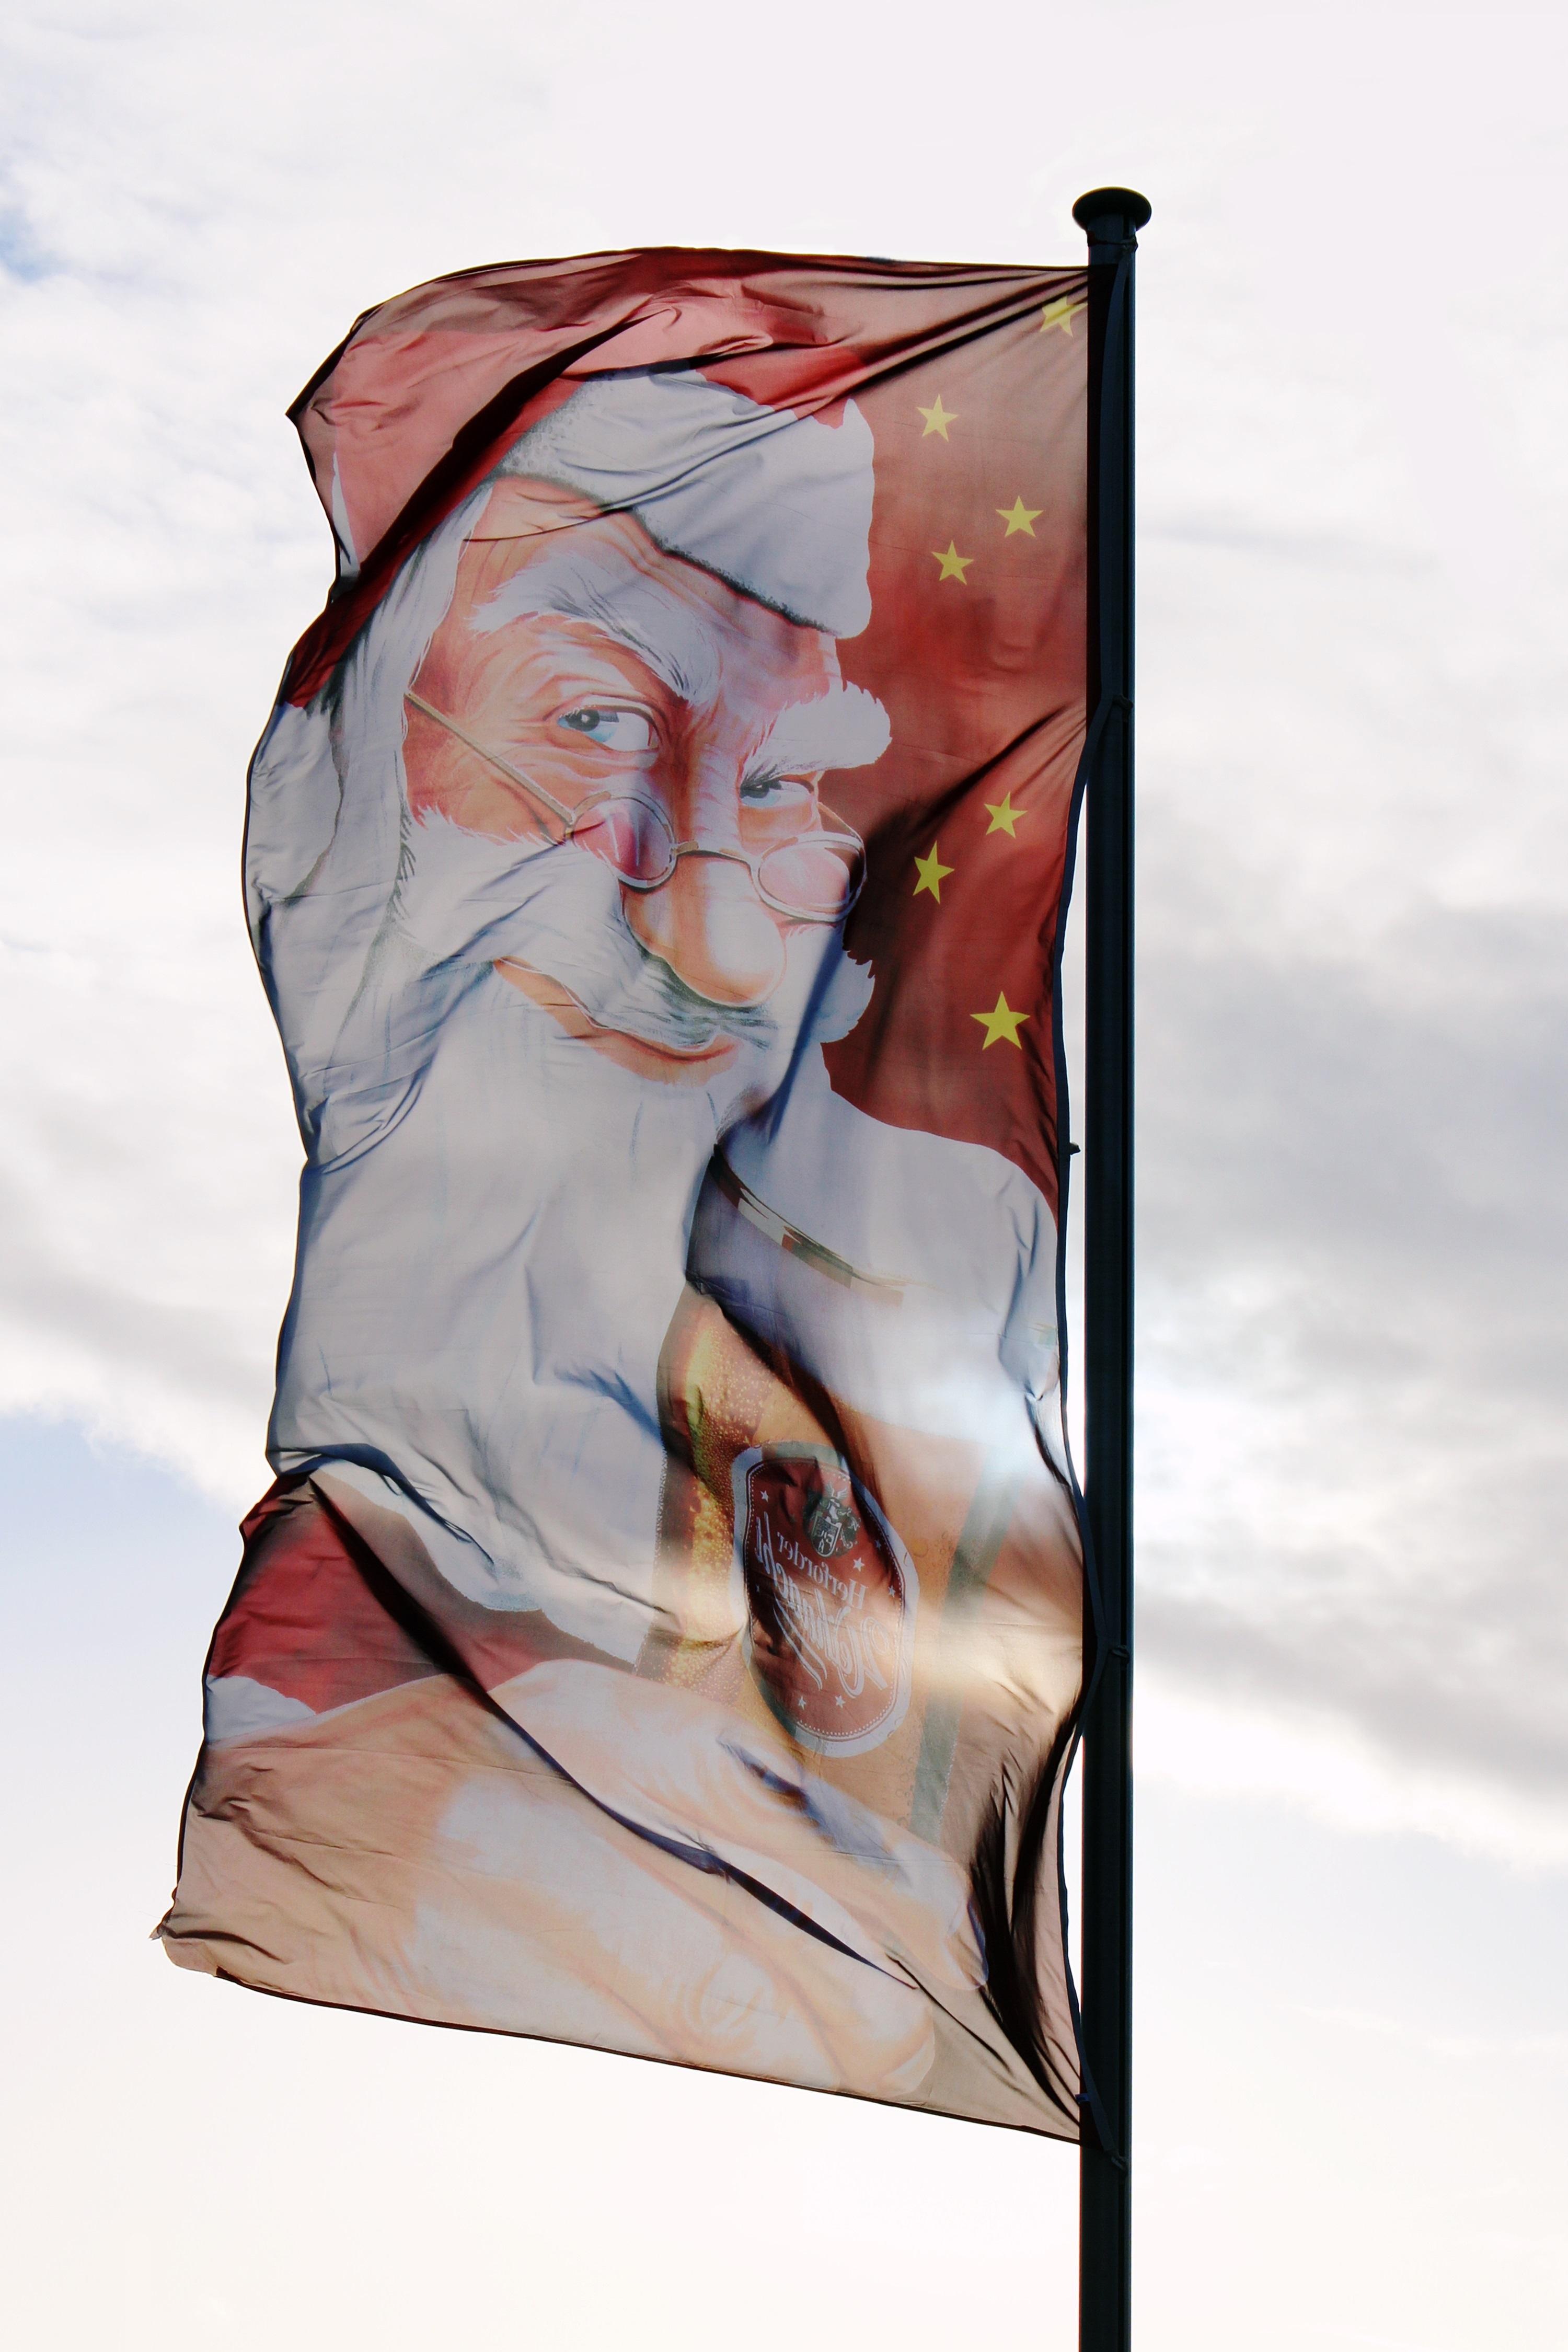 Gambar Angin Iklan Tiang Kapal Hari Natal Tiang Bendera Waktu